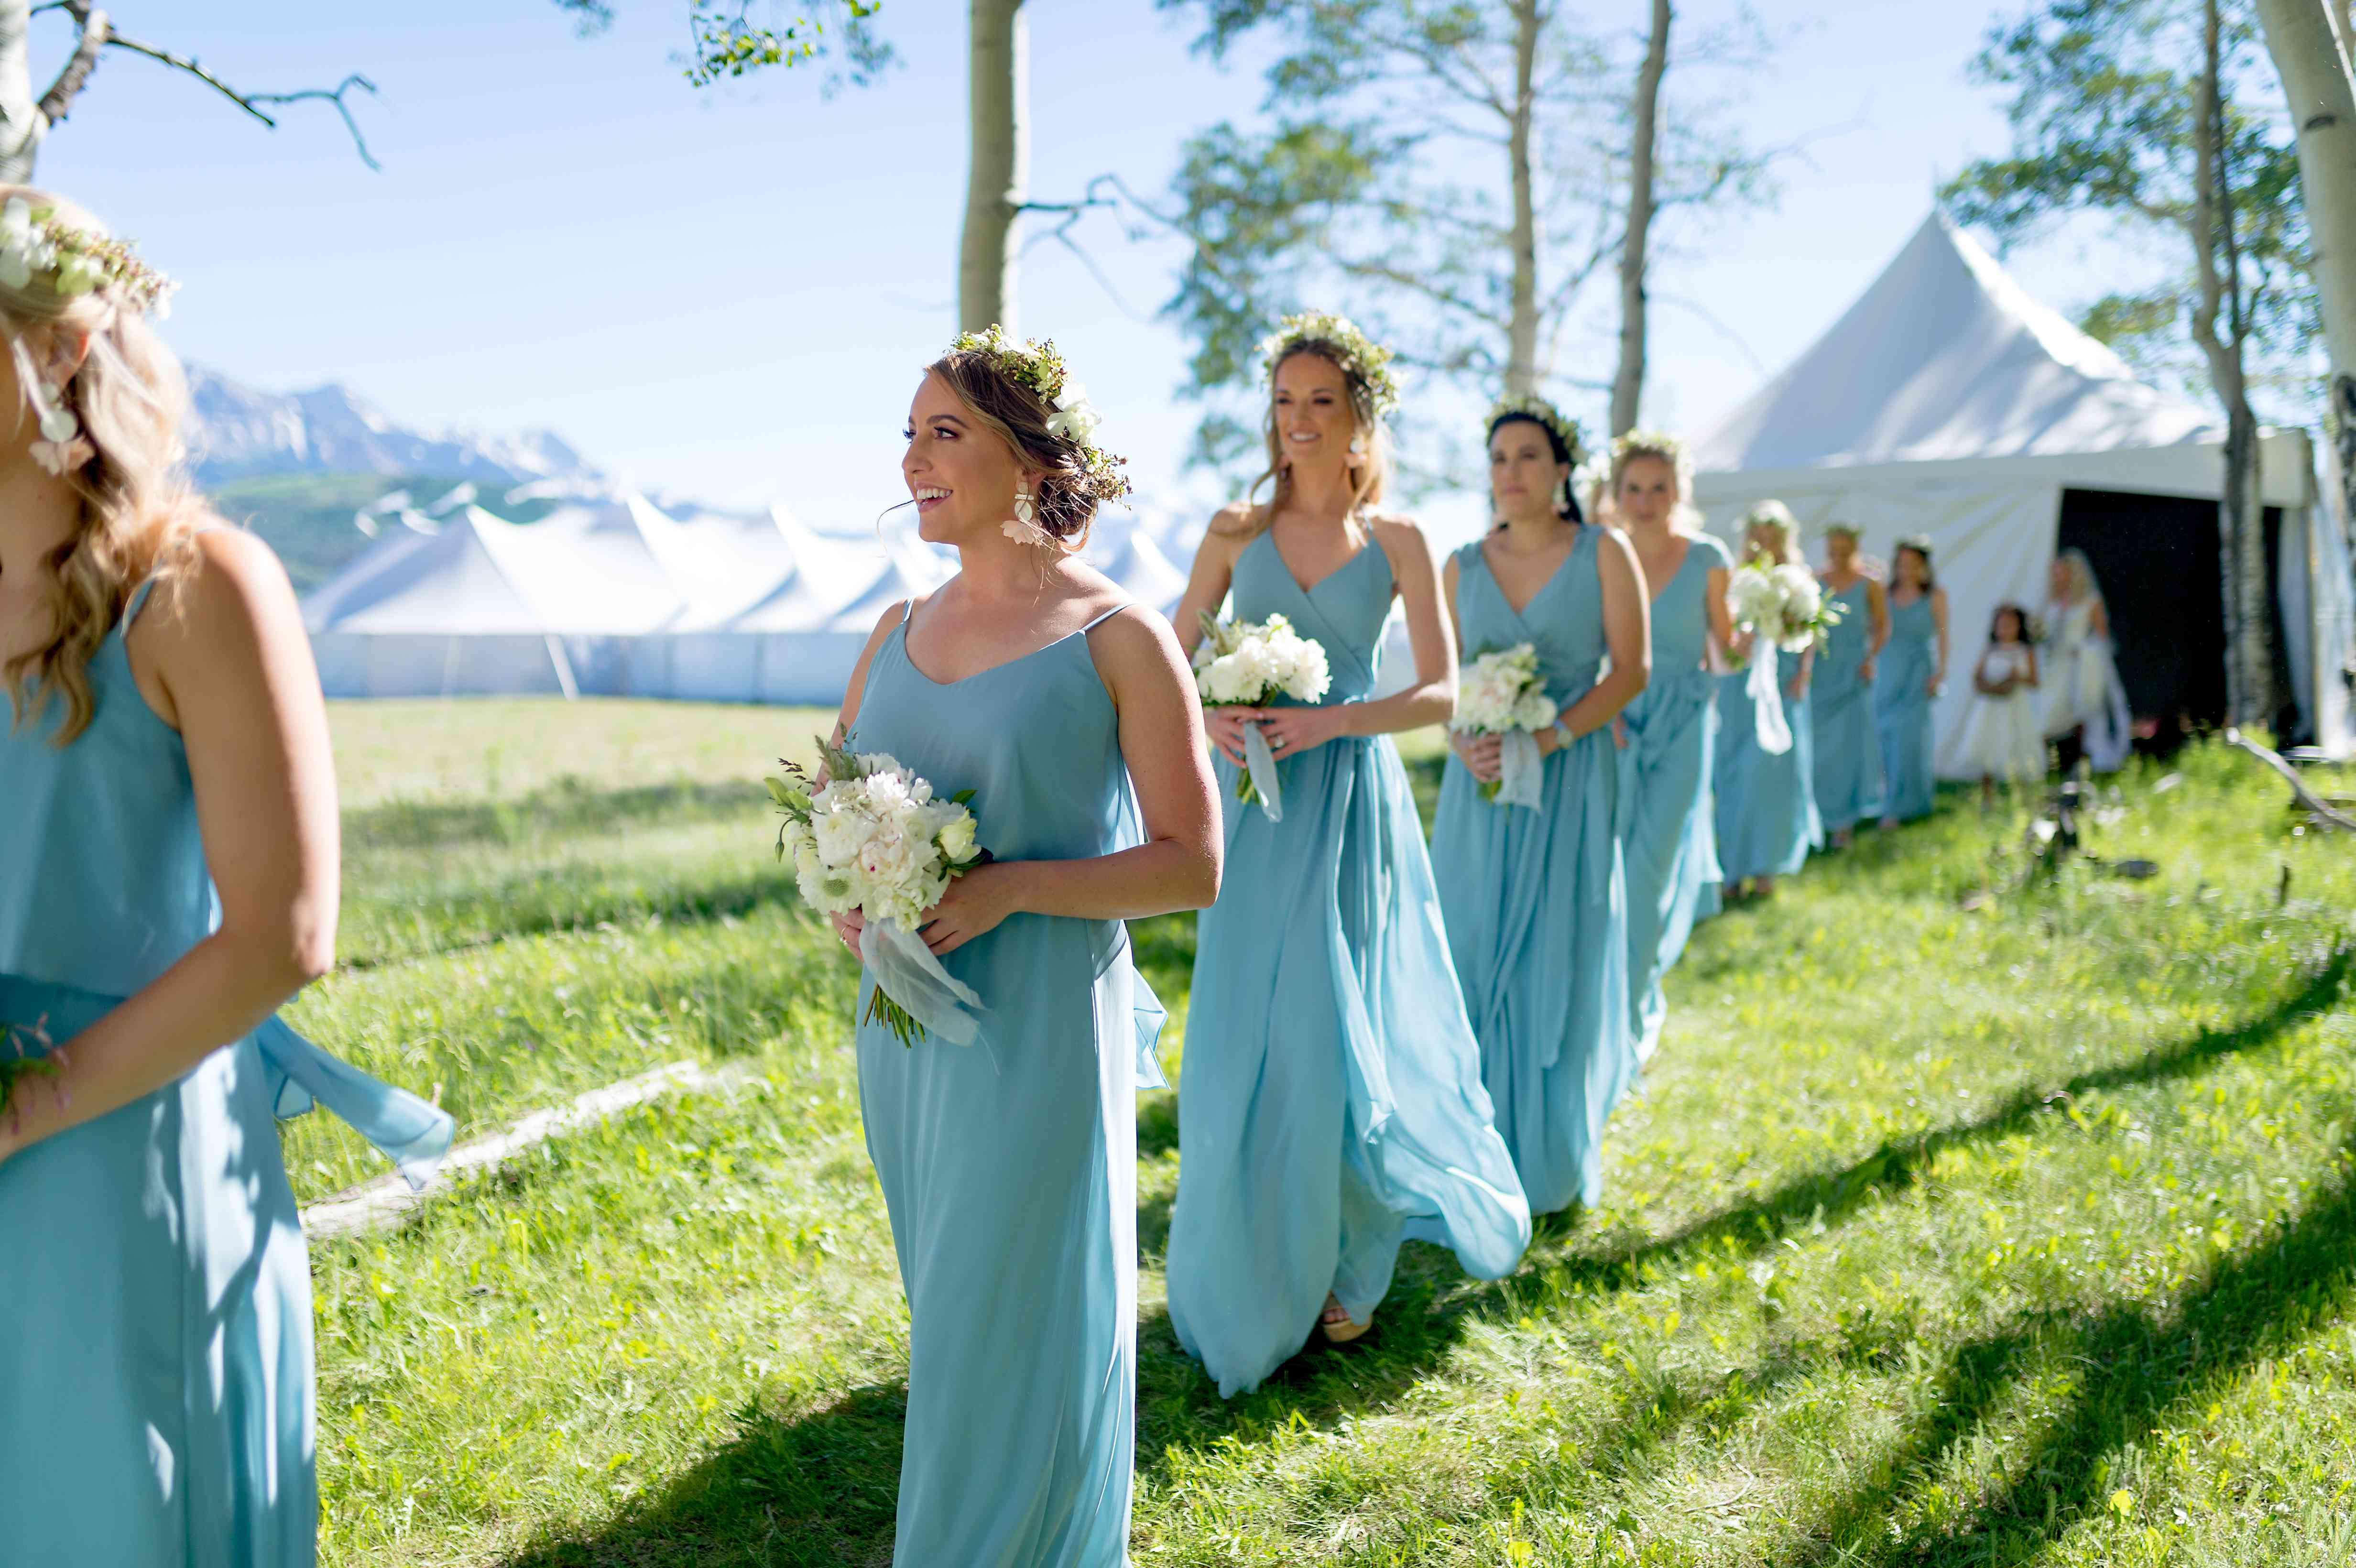 Bridesmaids walking toward ceremony